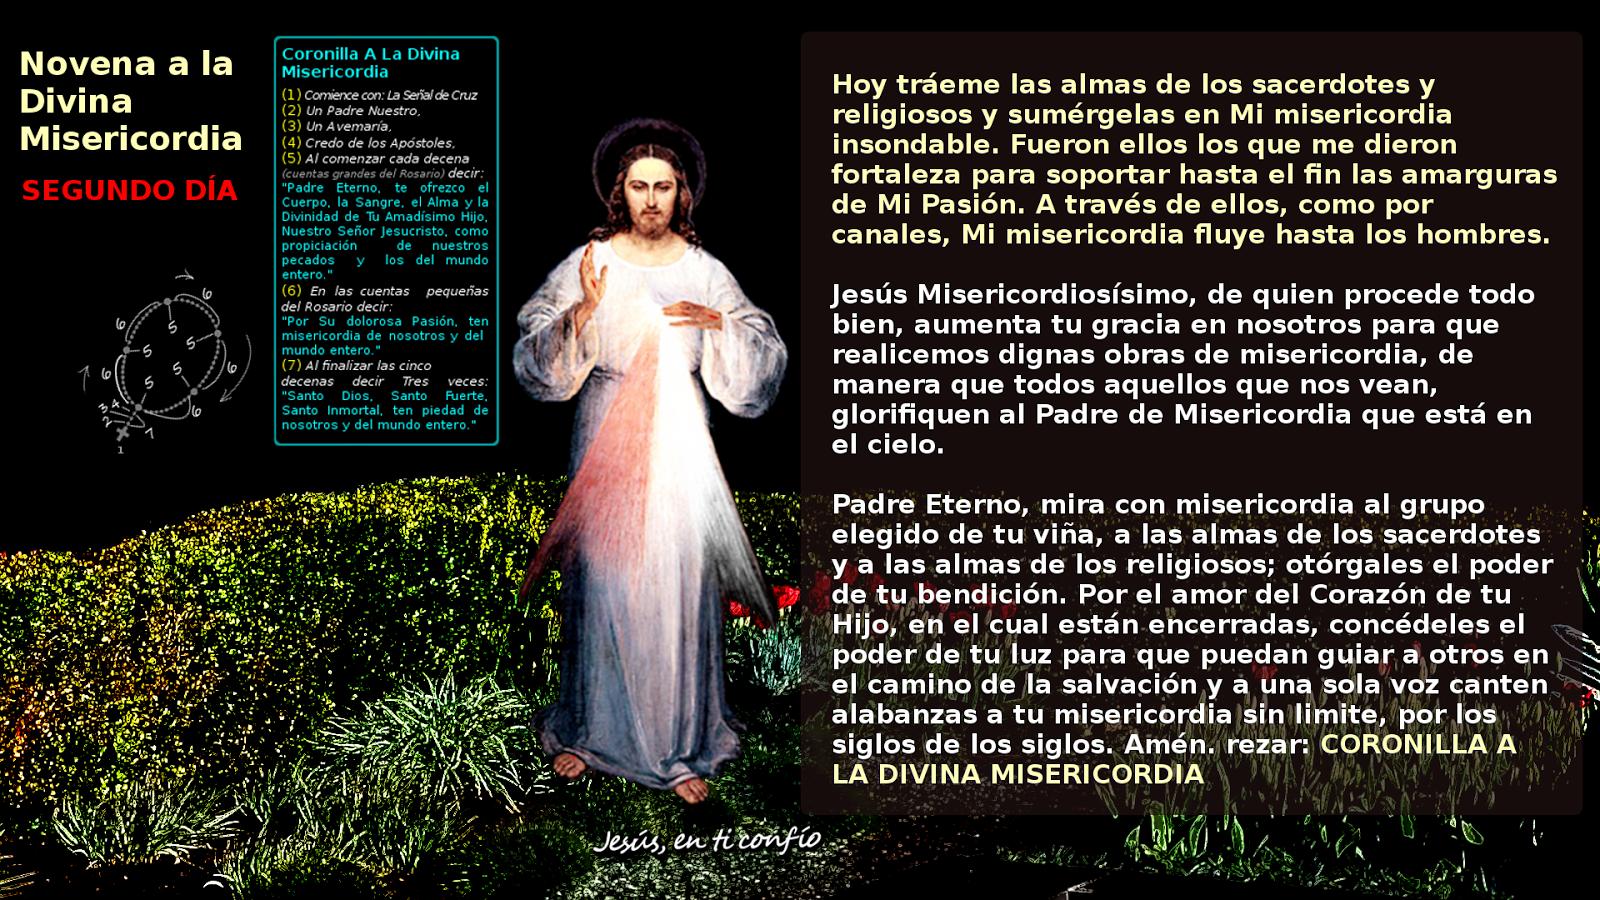 segundo dia de la novena divina misericordia